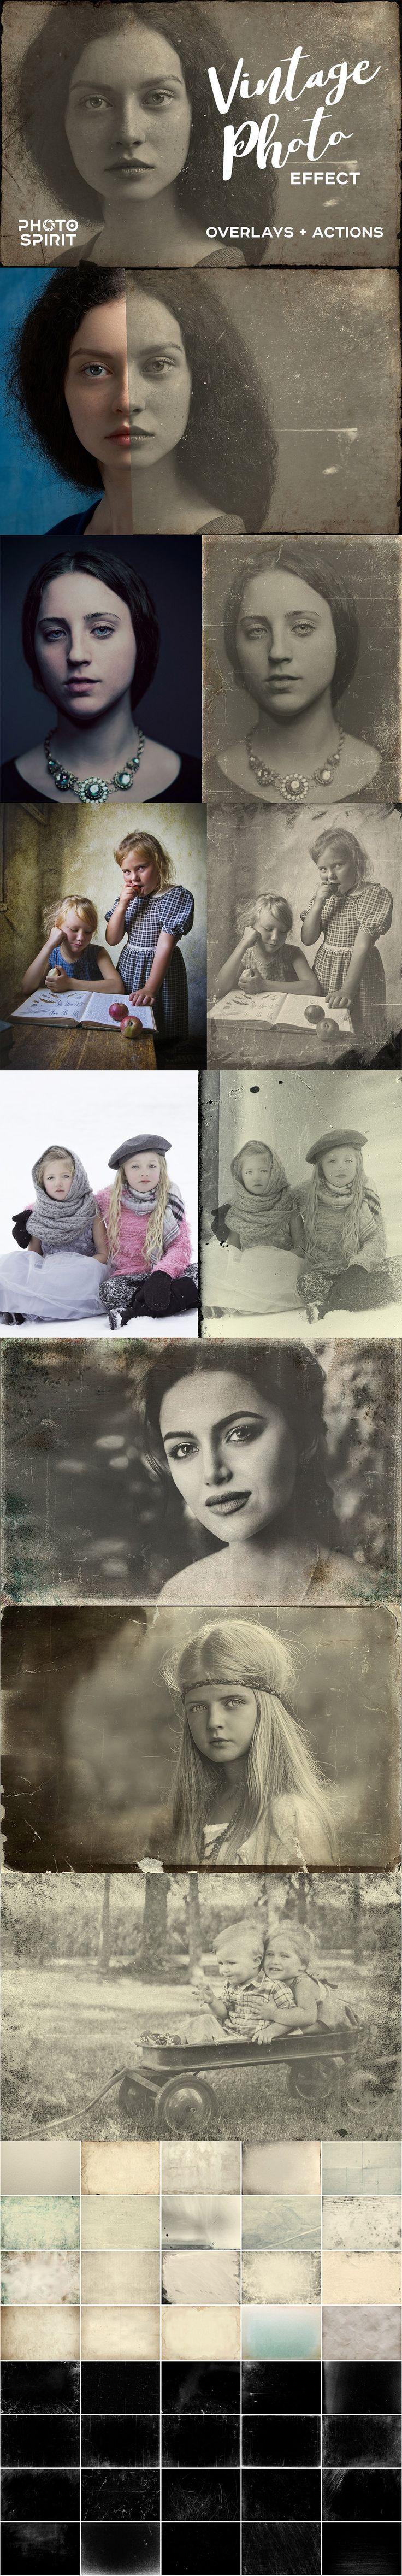 Vintage Old Photo Effect Overlays